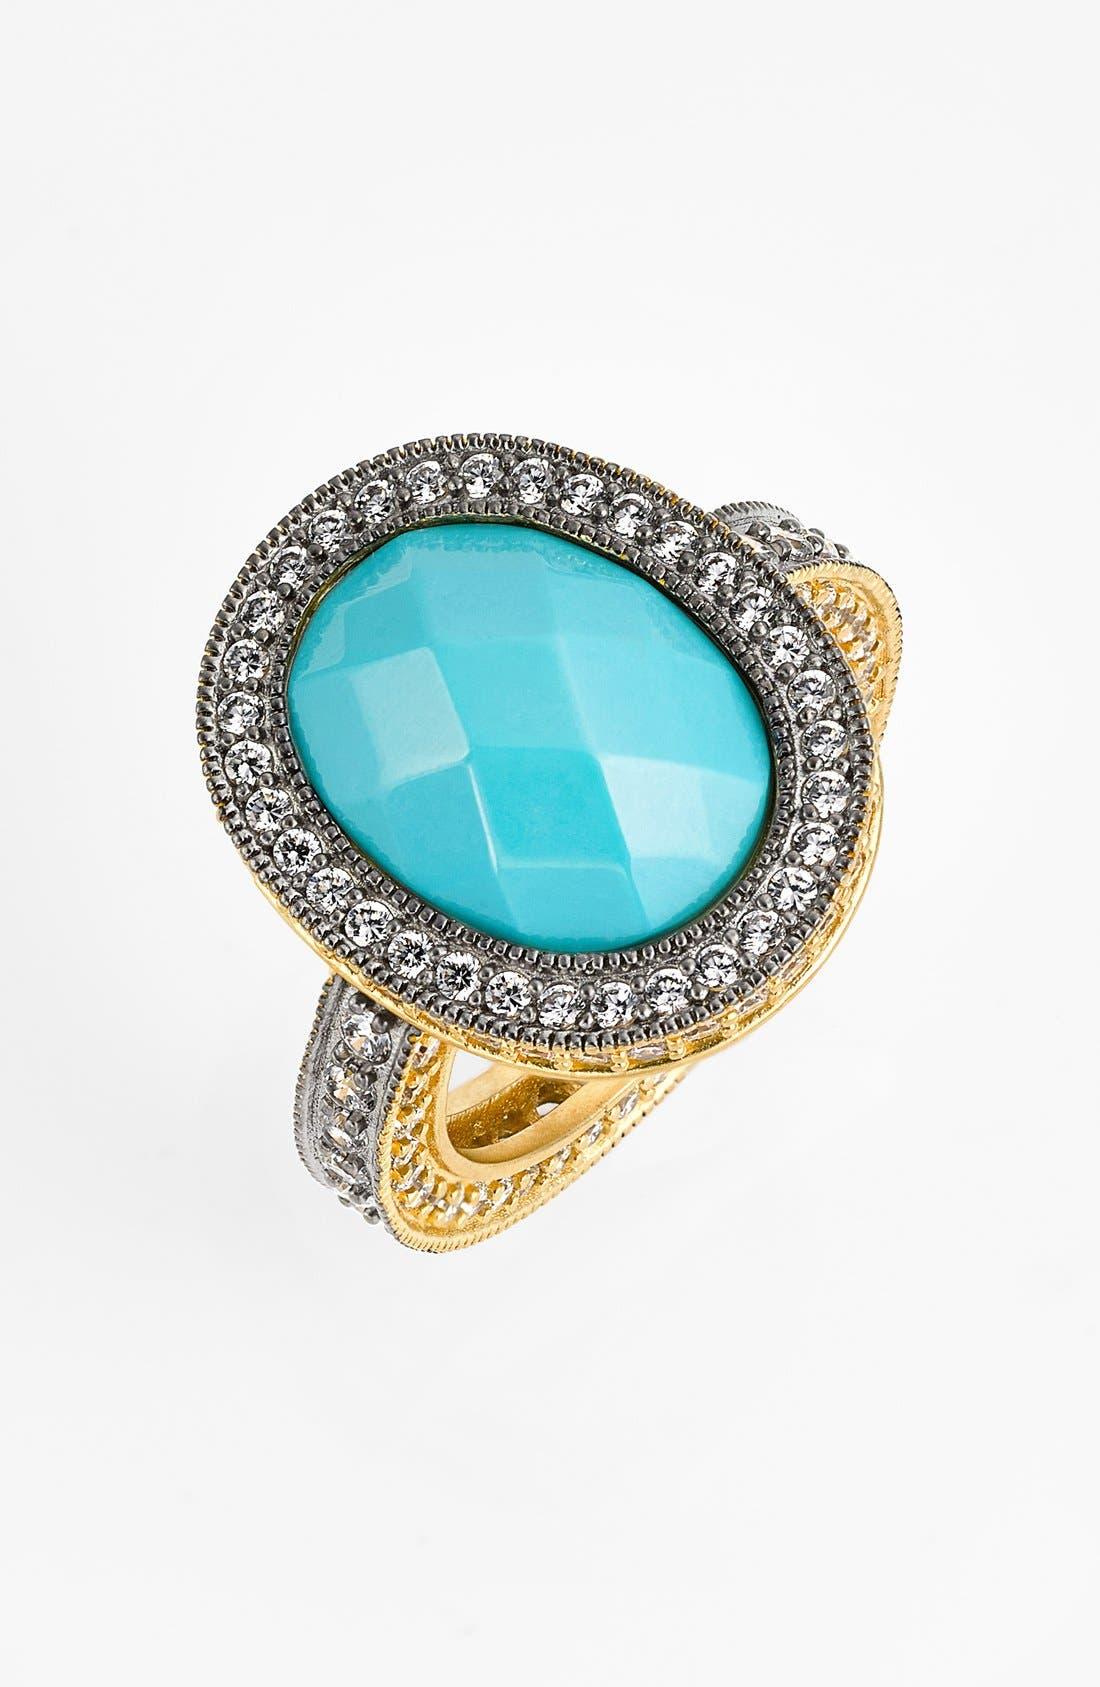 Main Image - FREIDA ROTHMAN 'Metropolitan' Oval Stone Ring